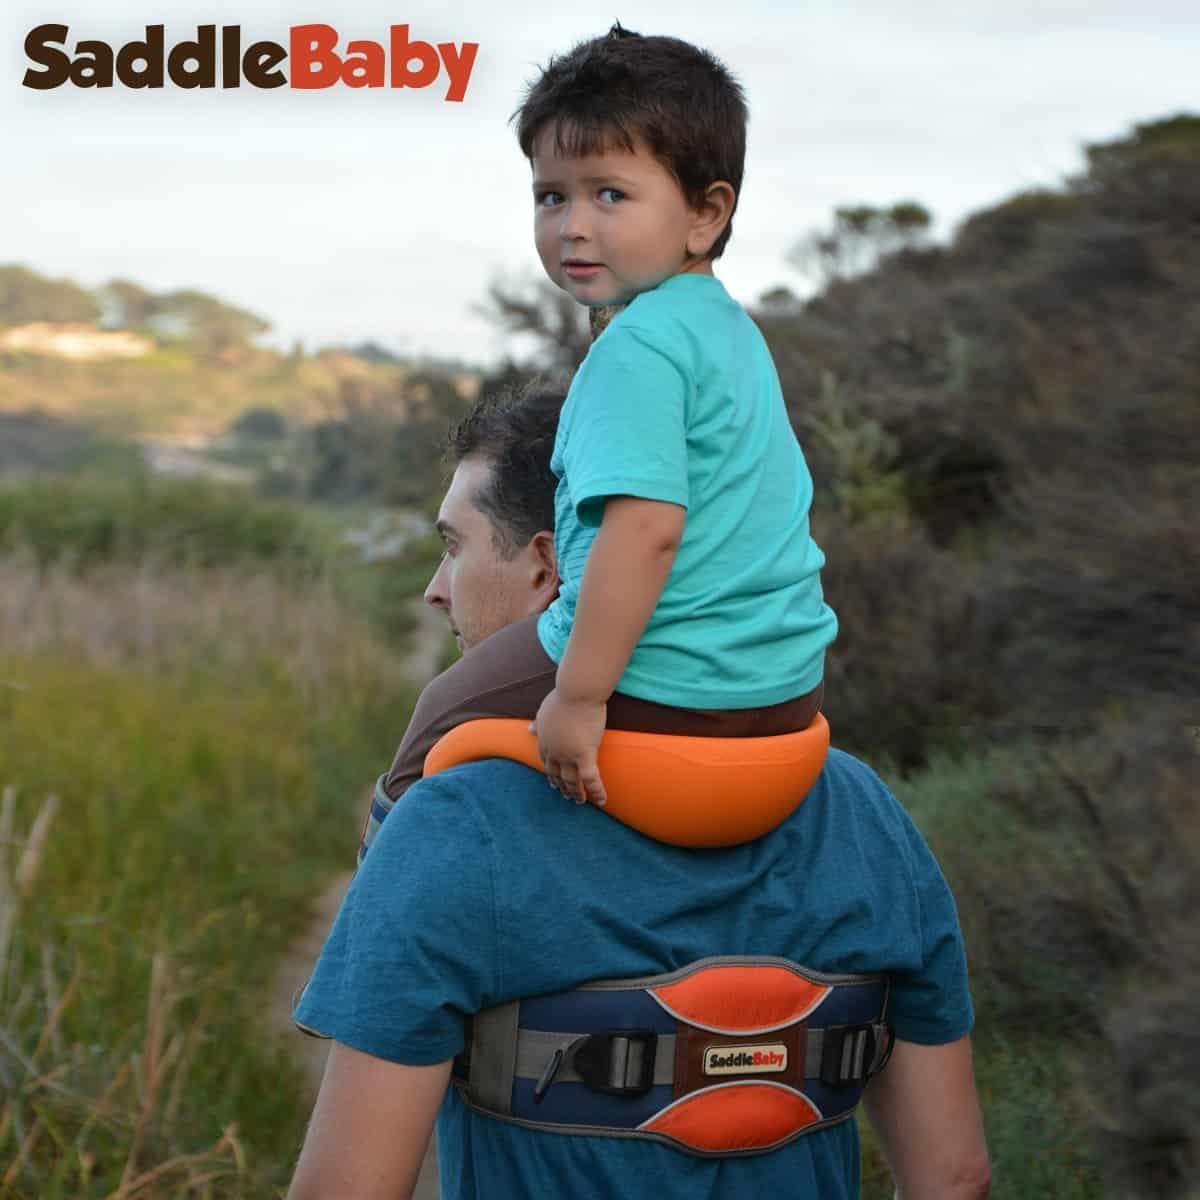 SaddleBaby Shoulder Carrier Kid Bonding with Father